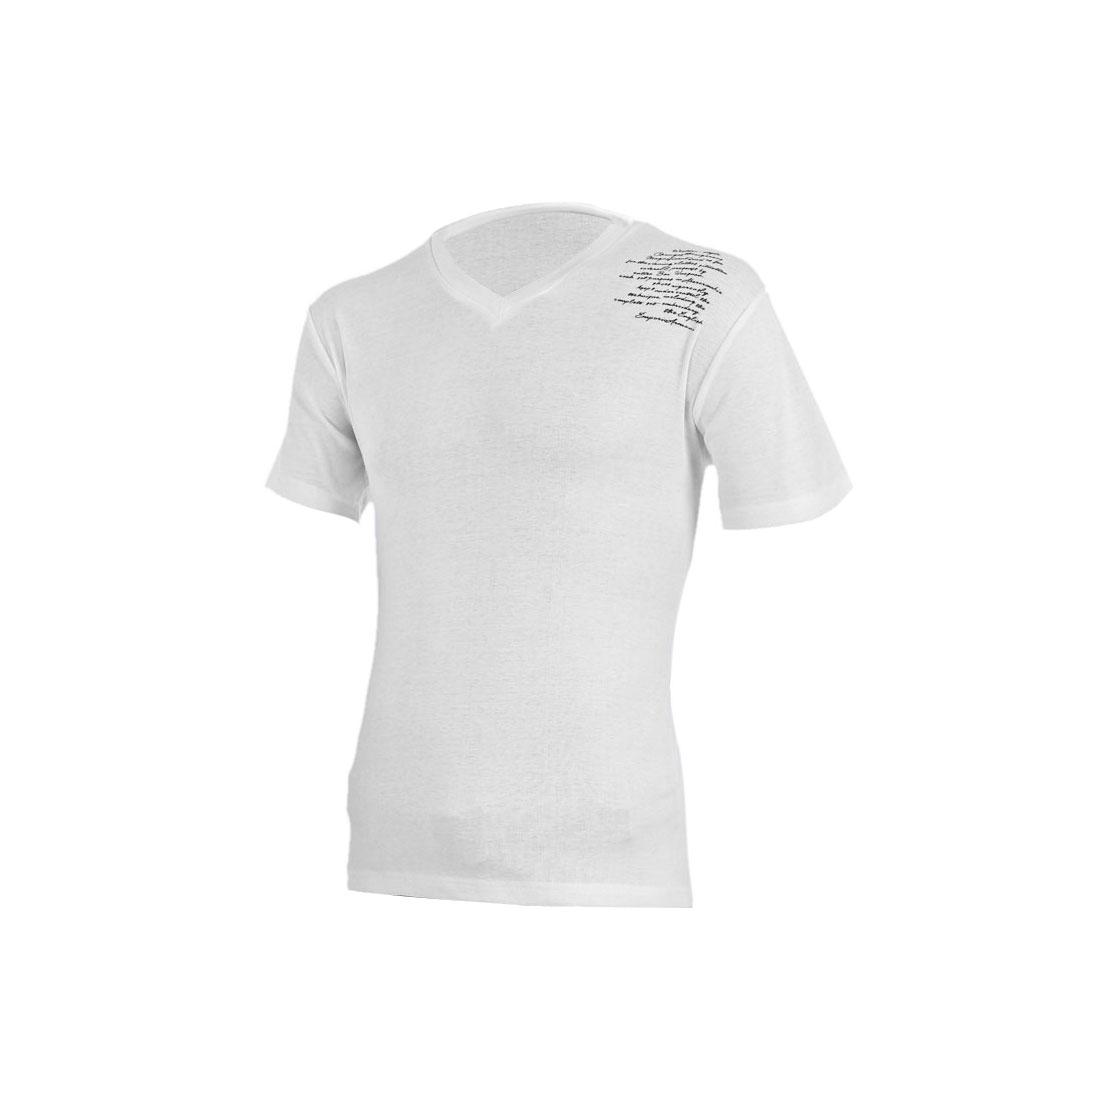 Mans V-Neckline Short Sleeve Letters Pattern Fashional White T-Shirt M